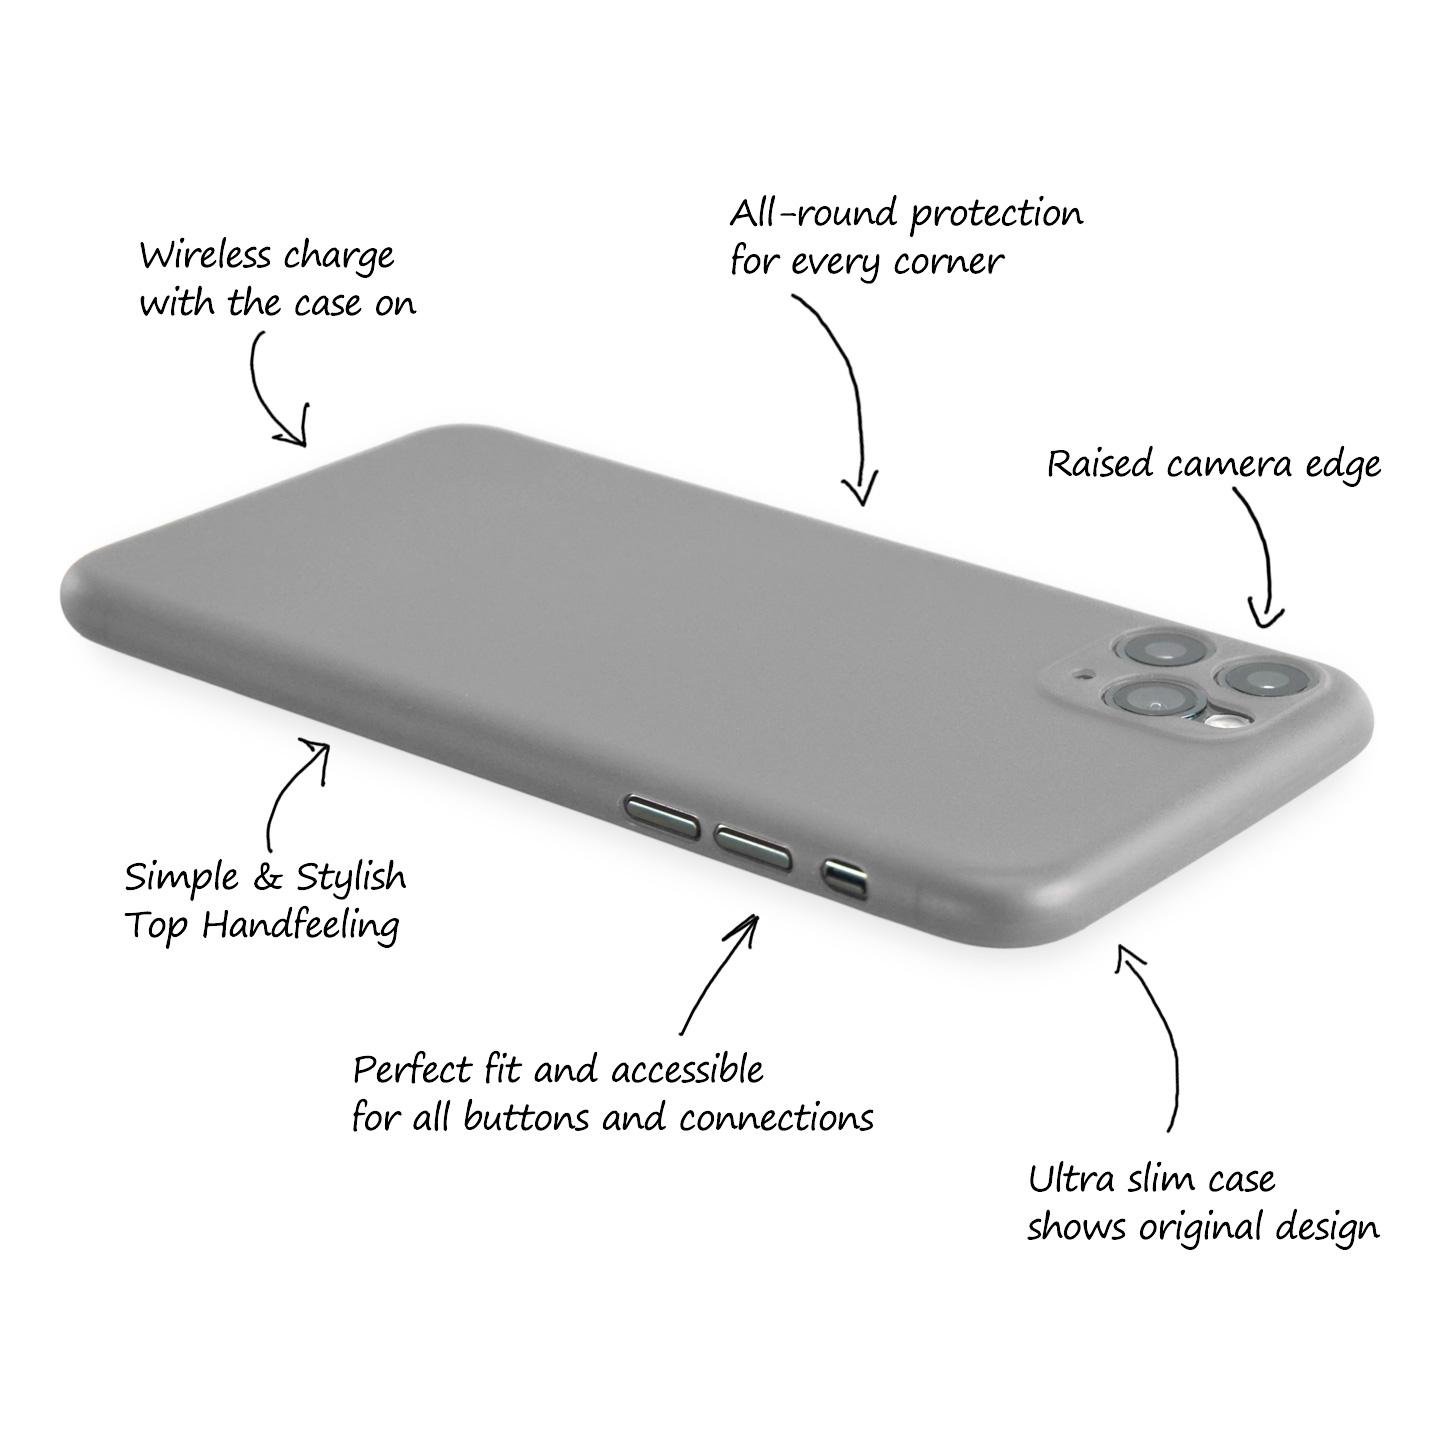 Ultra-Slim-Case-iPhone-11-Pro-5-8-034-Matt-Clear-Schutz-Huelle-Skin-Cover-Etui-Folie Indexbild 38